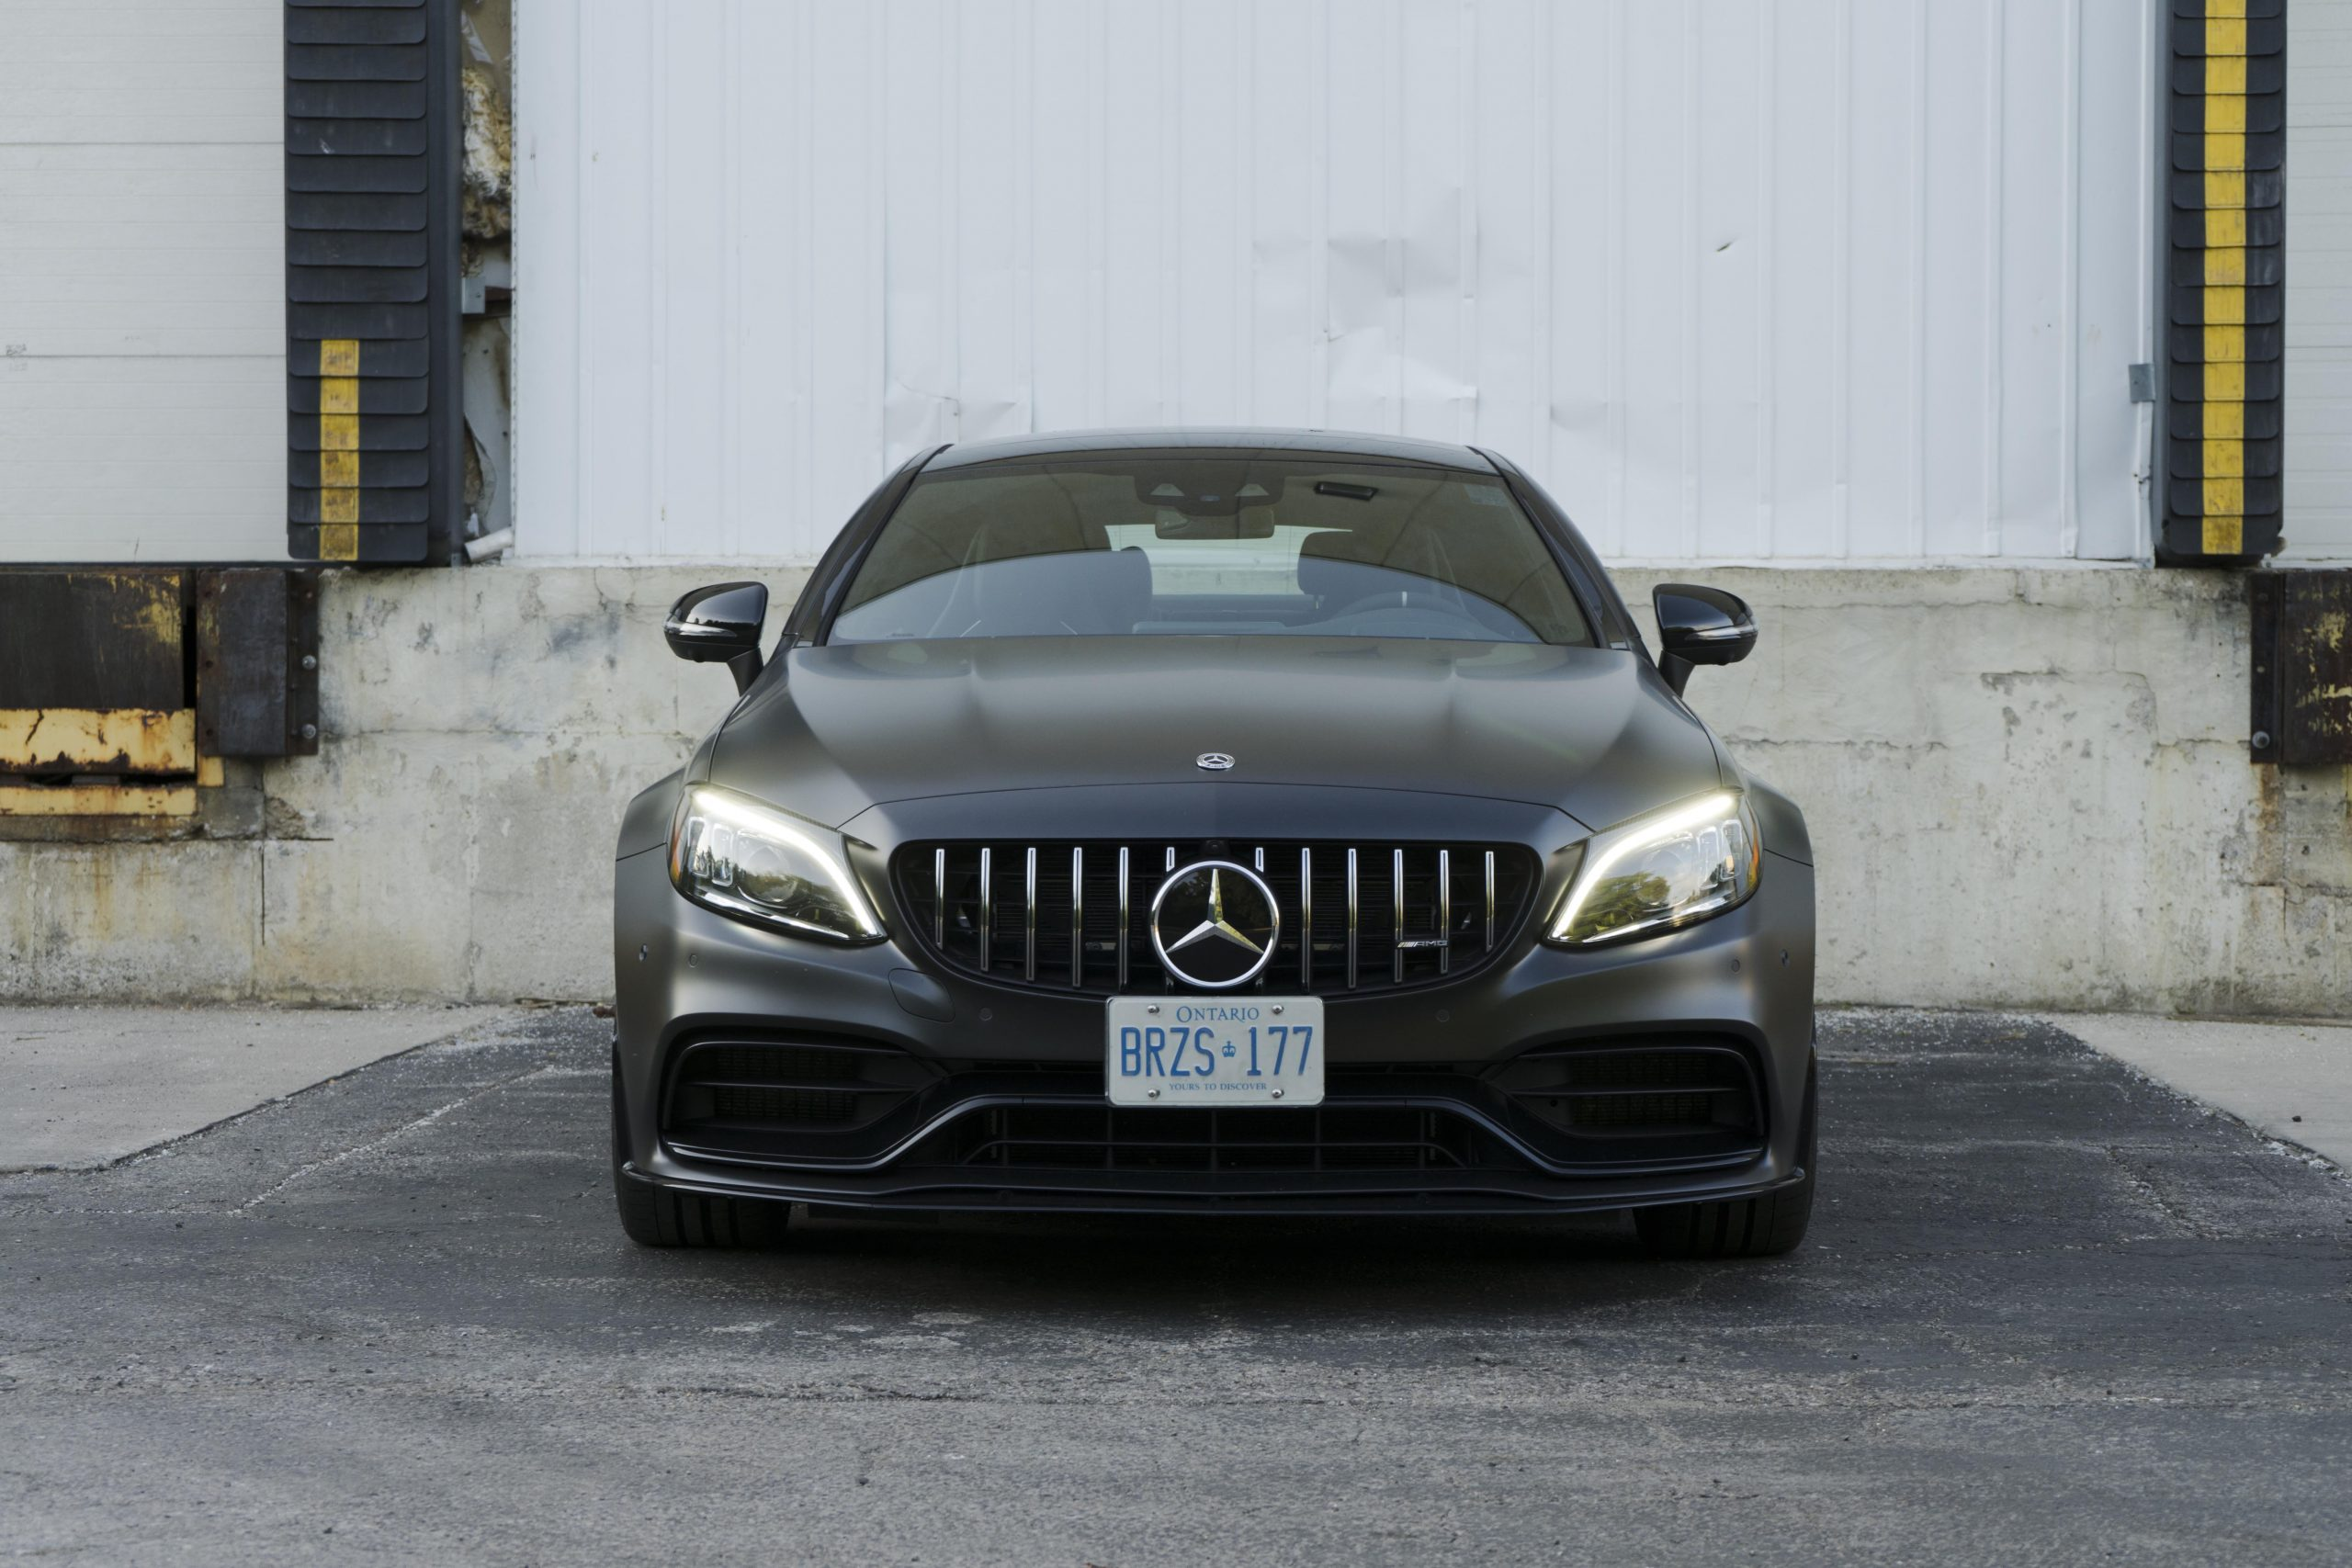 2020 Mercedes AMG C 63 S